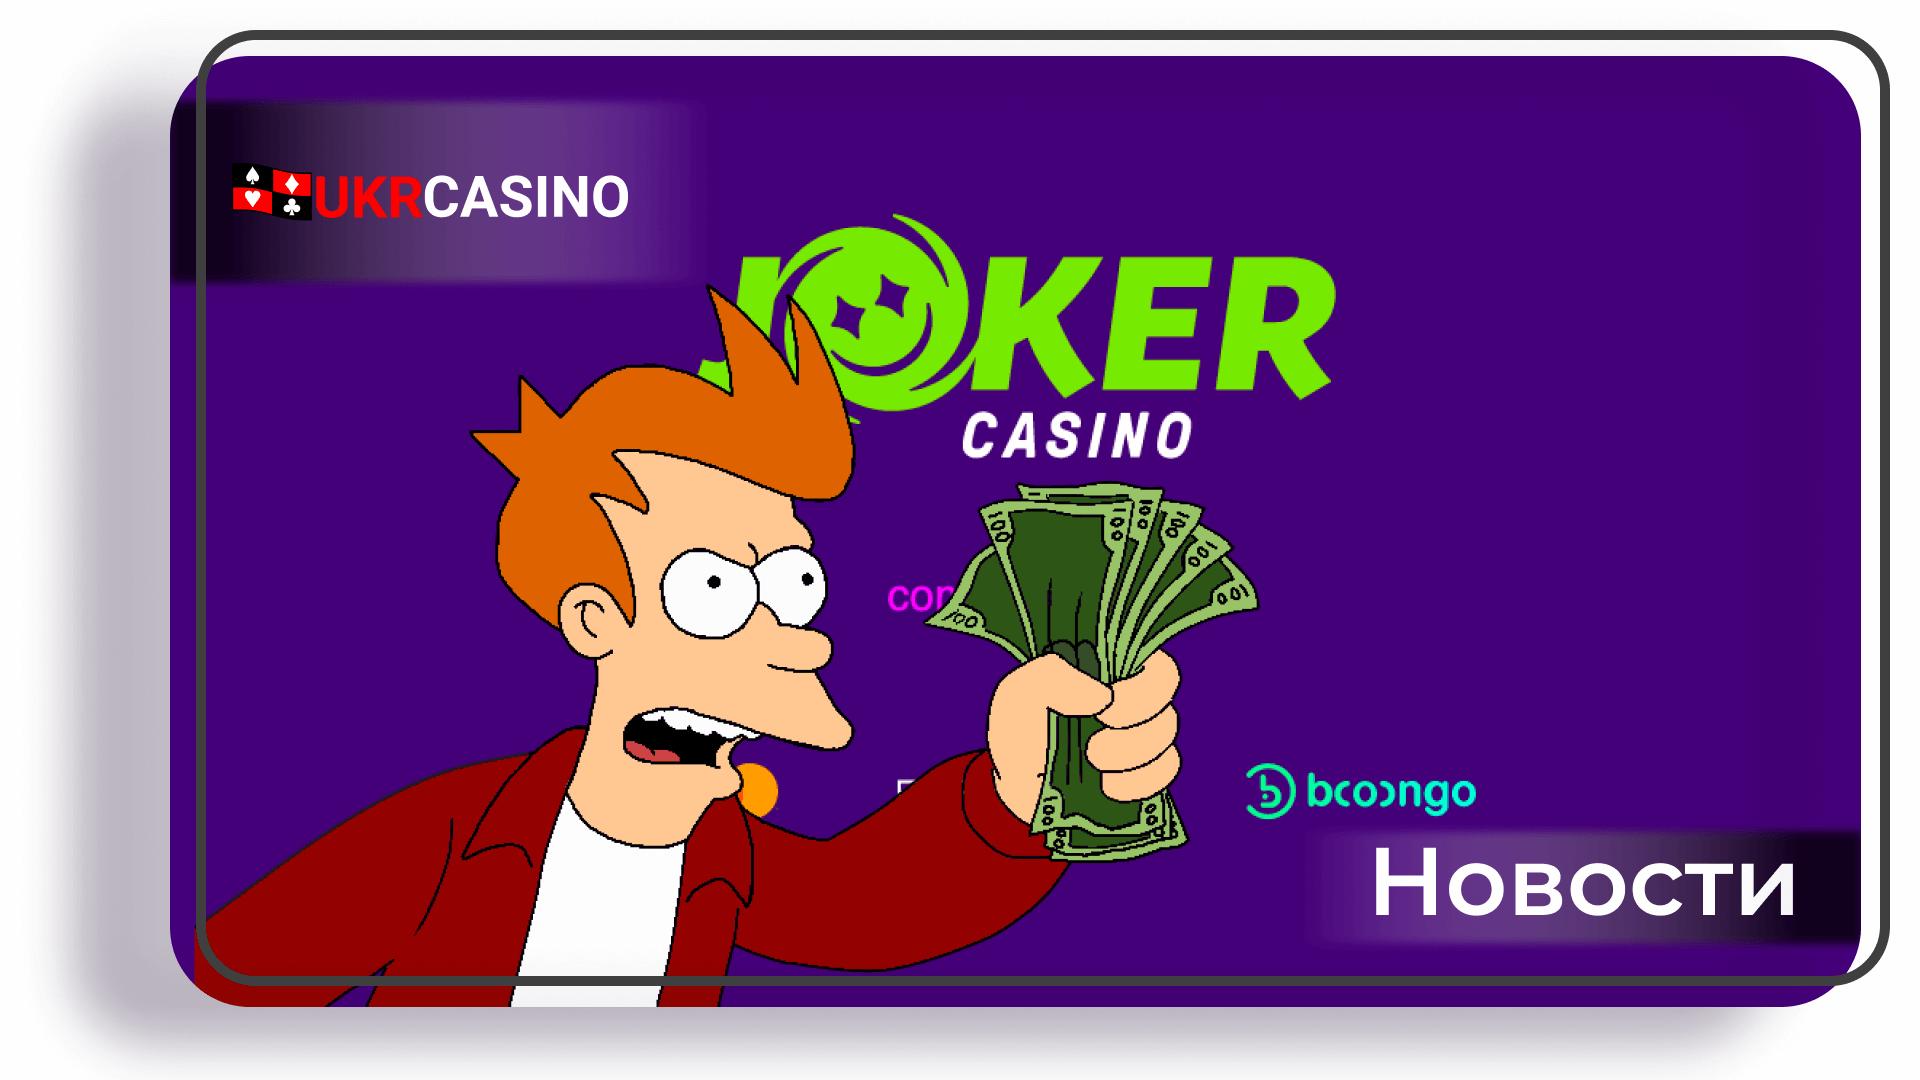 Онлайн-заведение Joker заплатило 23,4 миллиона гривен за лицензию